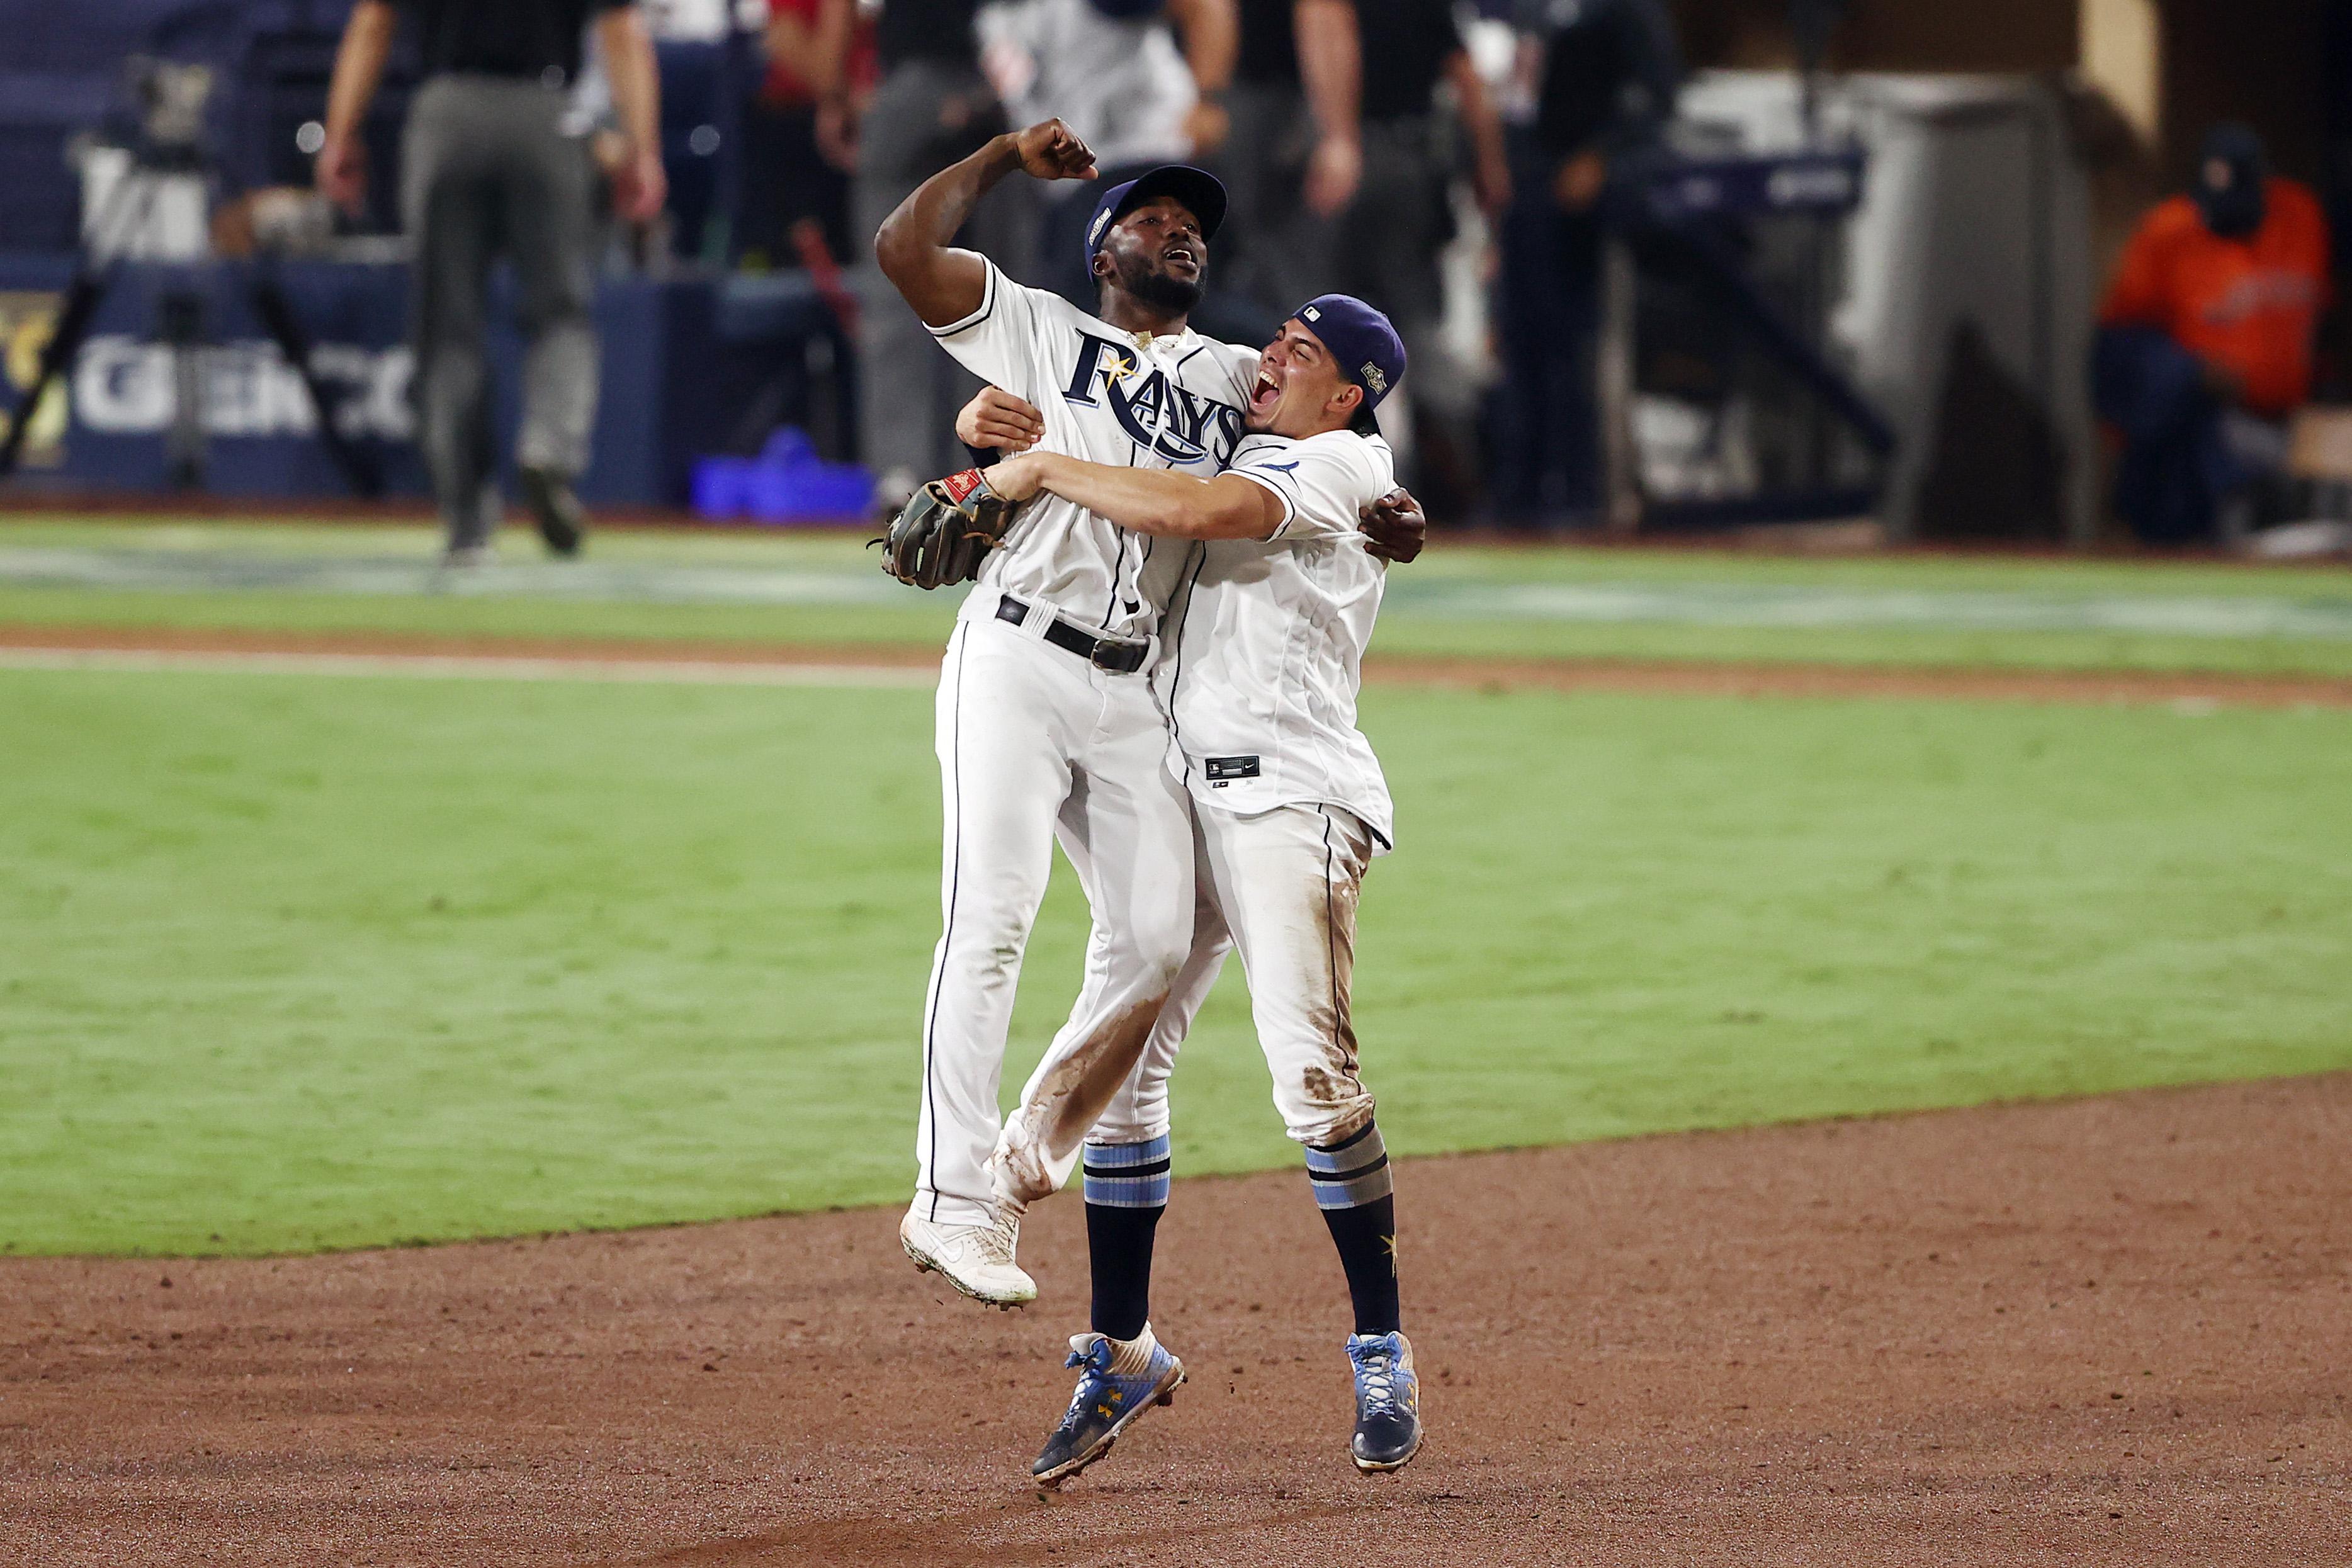 联盟锦标赛 - 休斯顿Astros v Tampa Bay Rays  - 游戏七